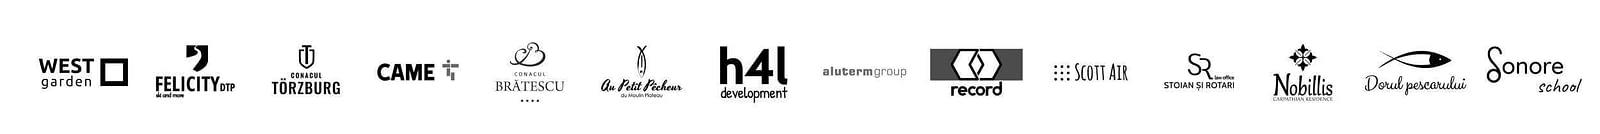 website design, website, UI design, UI, design, Toud, design website